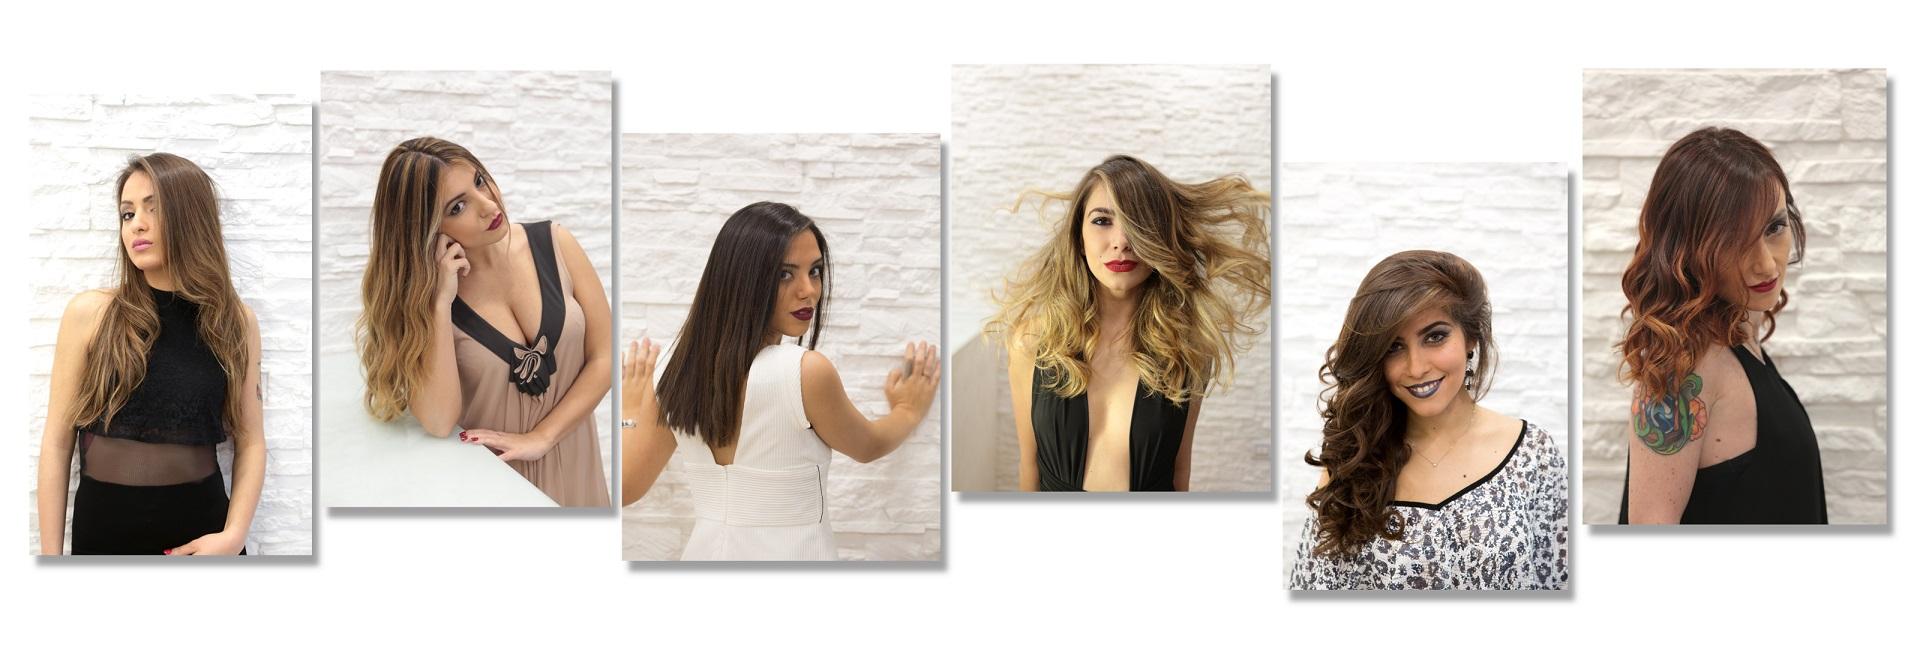 Cinzia Caputo parrucchieri | Centro Degradé Joelle - Foggia | concorrenti miss degrade 2016